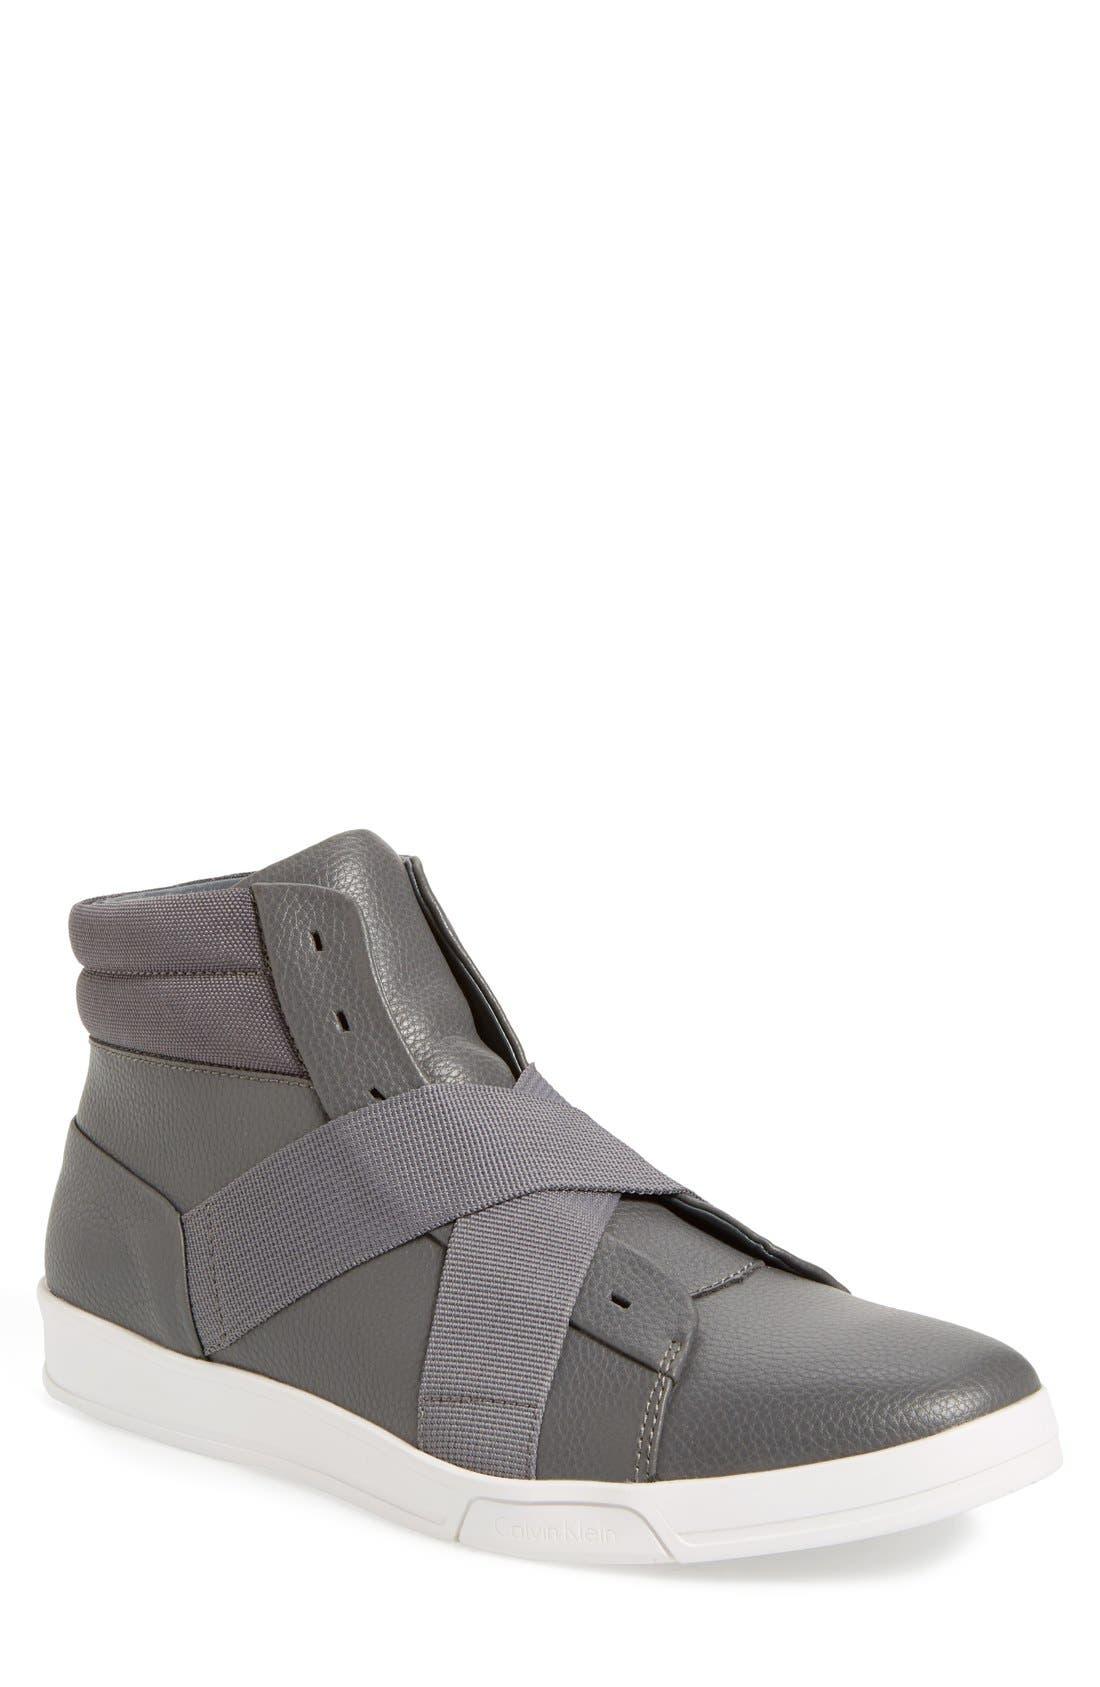 Main Image - Calvin Klein 'Banjo' High Top Sneaker (Men)